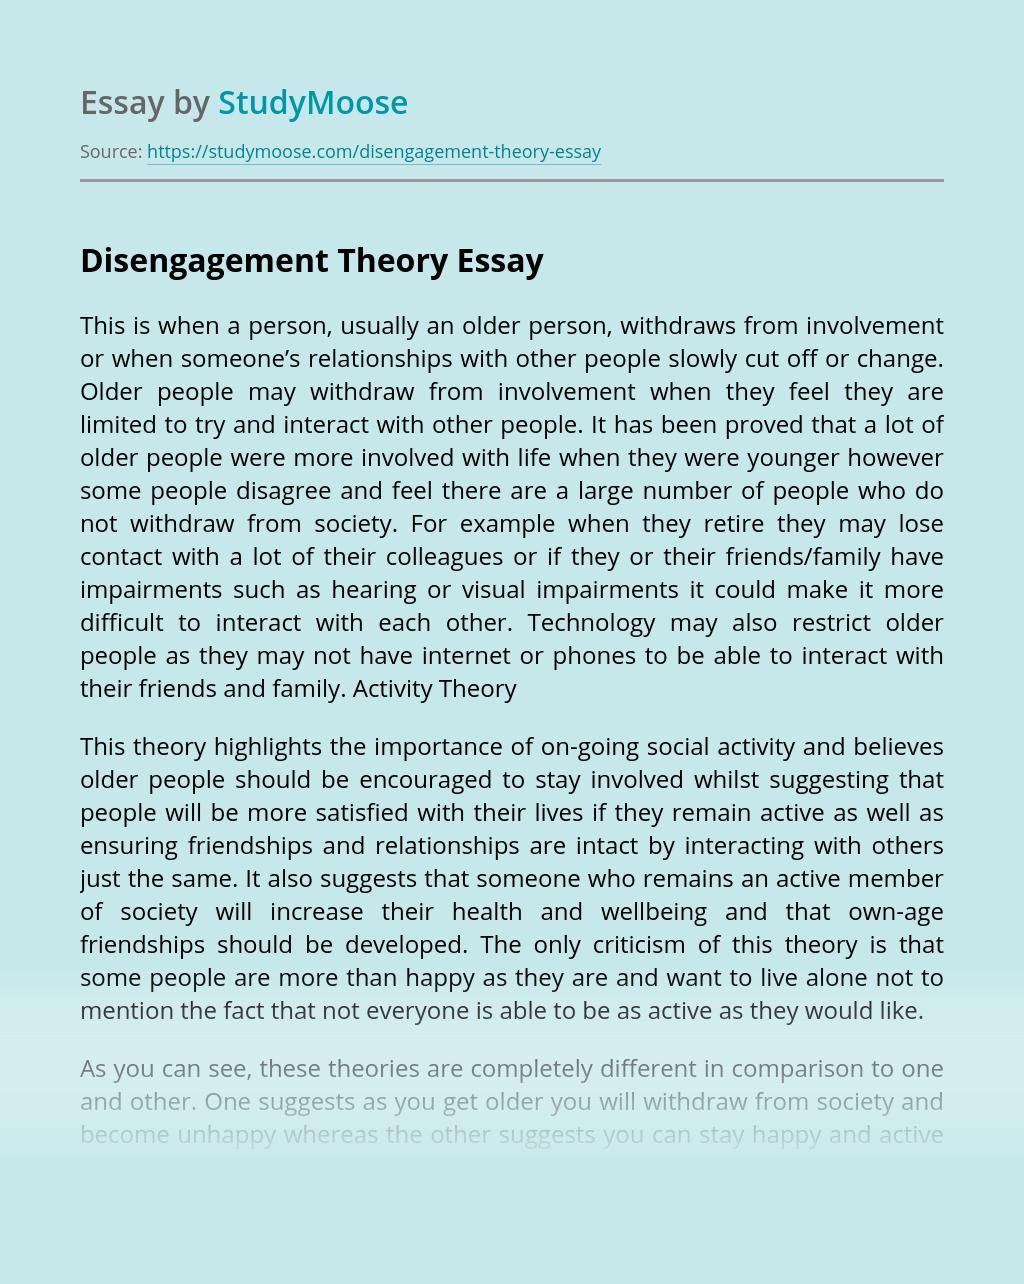 Disengagement Theory